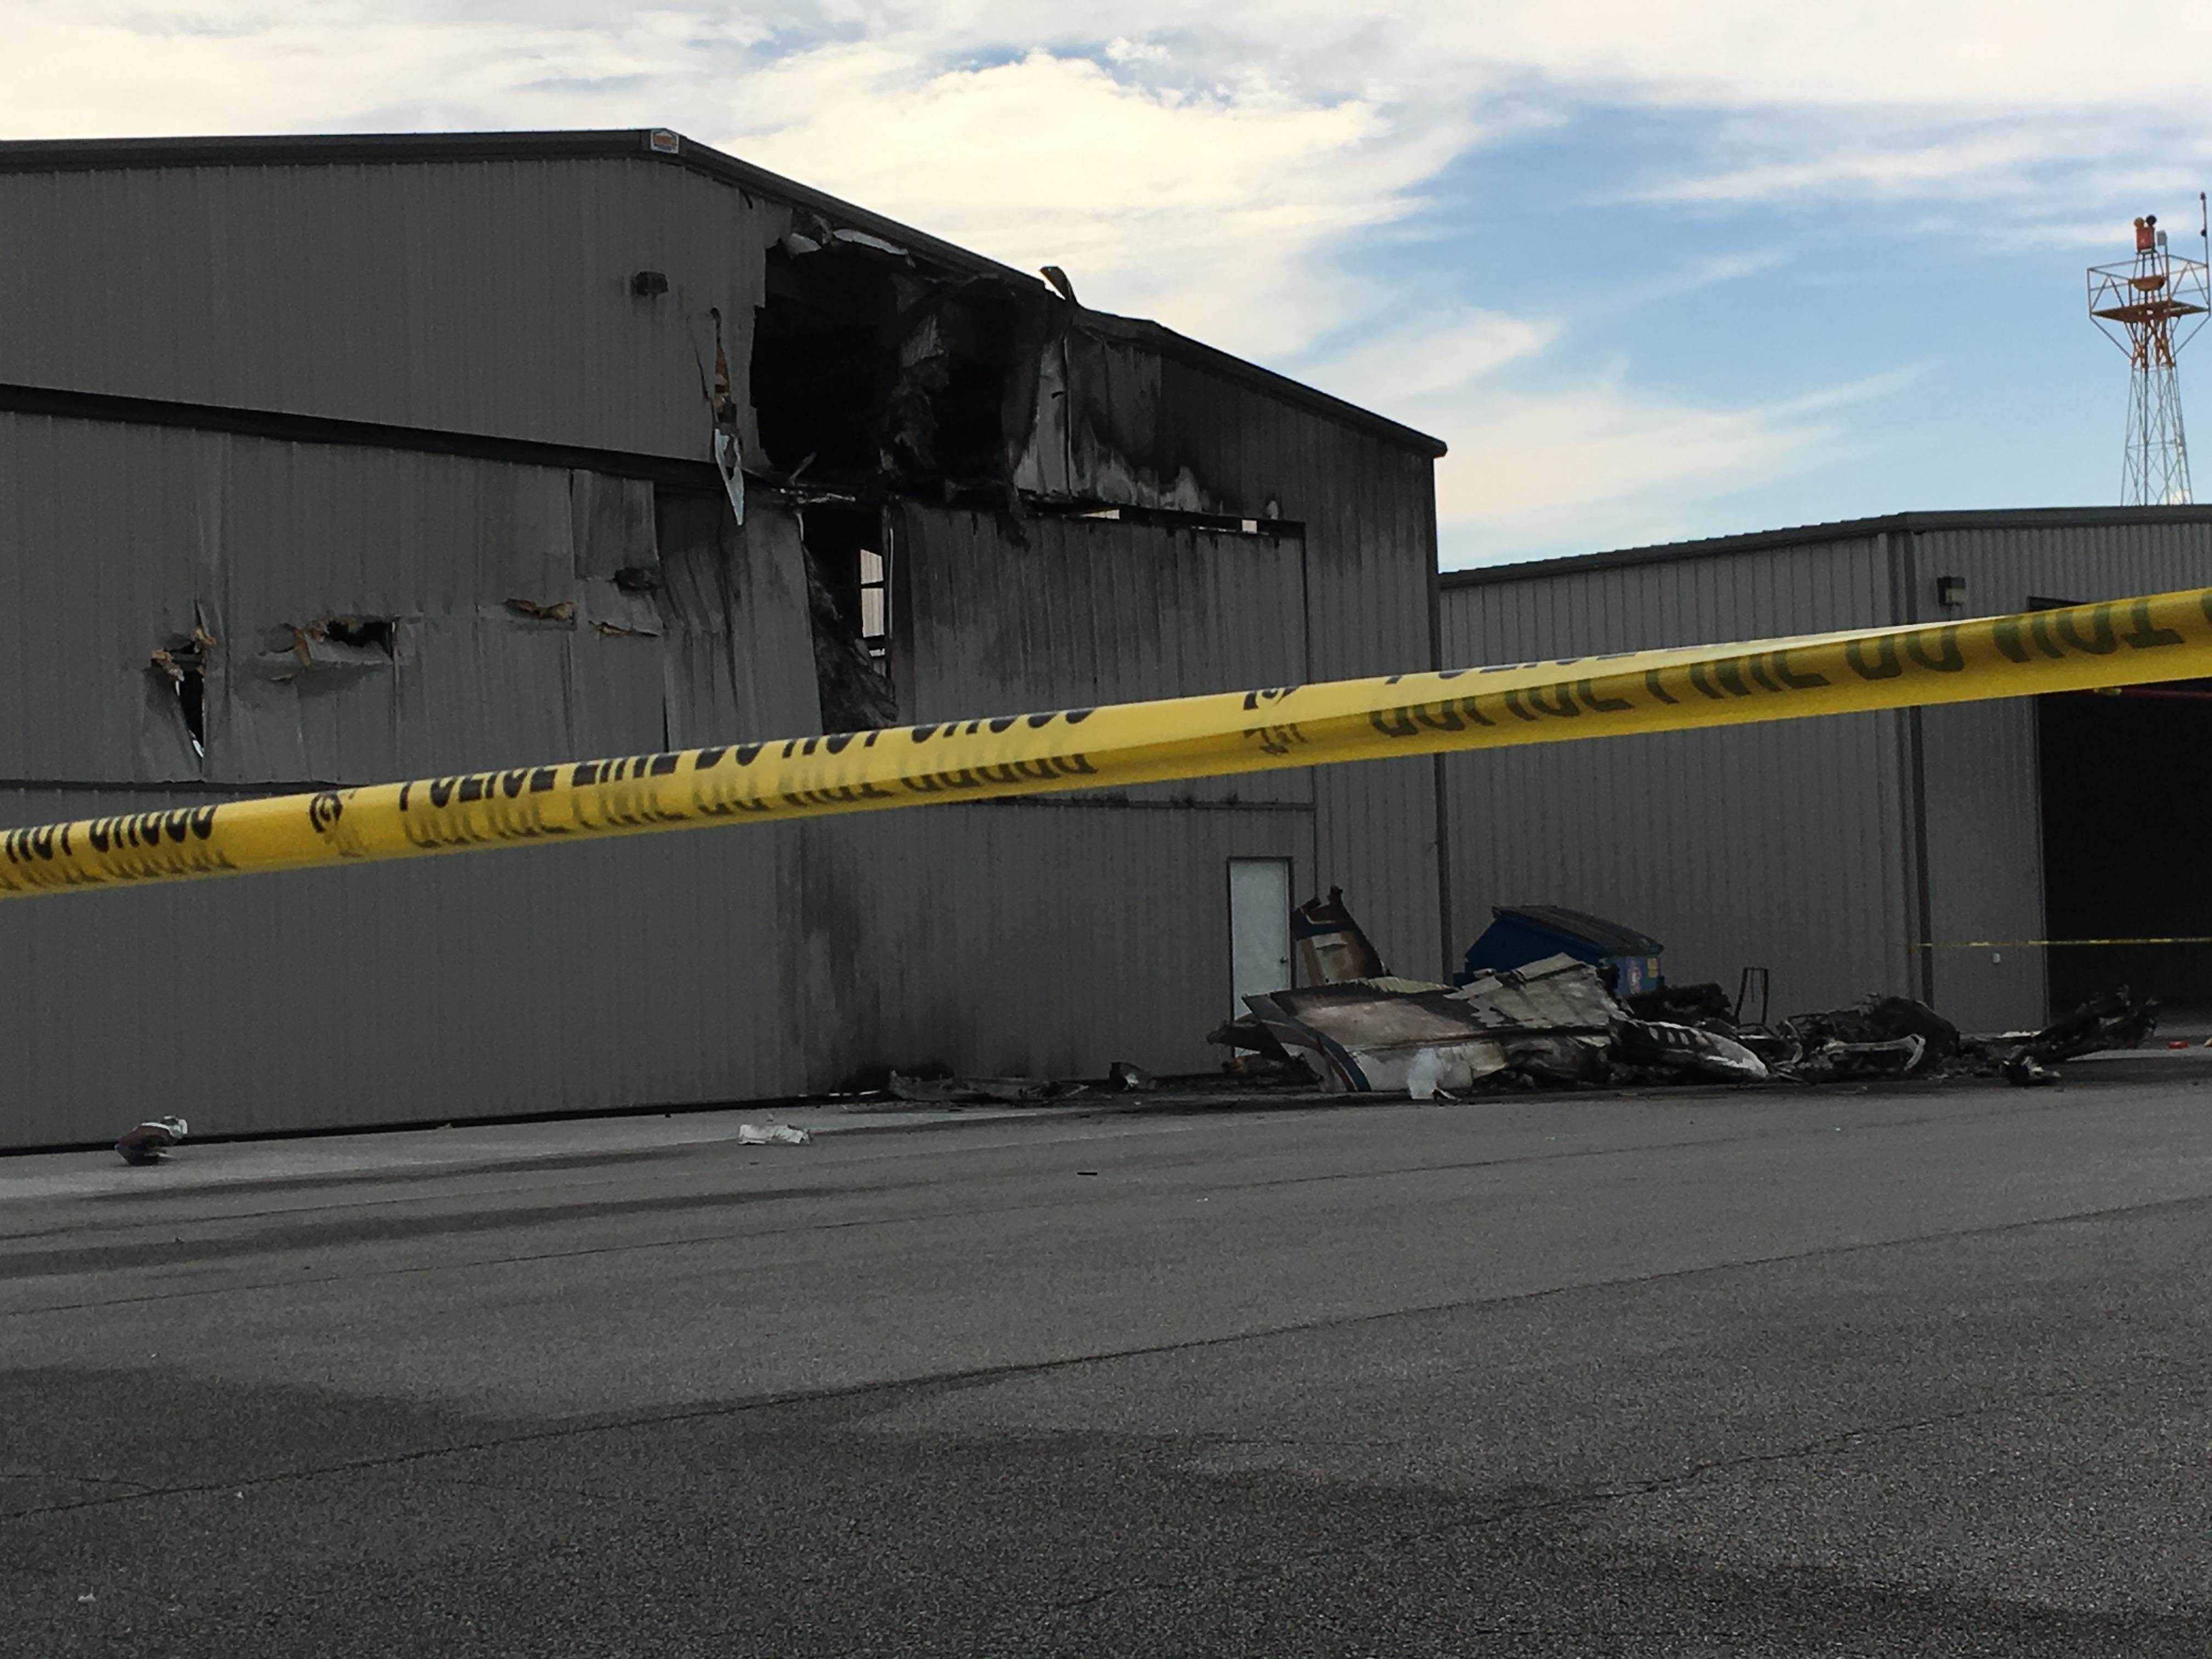 http://localtvkfsm.files.wordpress.com/2016/08/bentonville-plane-crash81.jpg